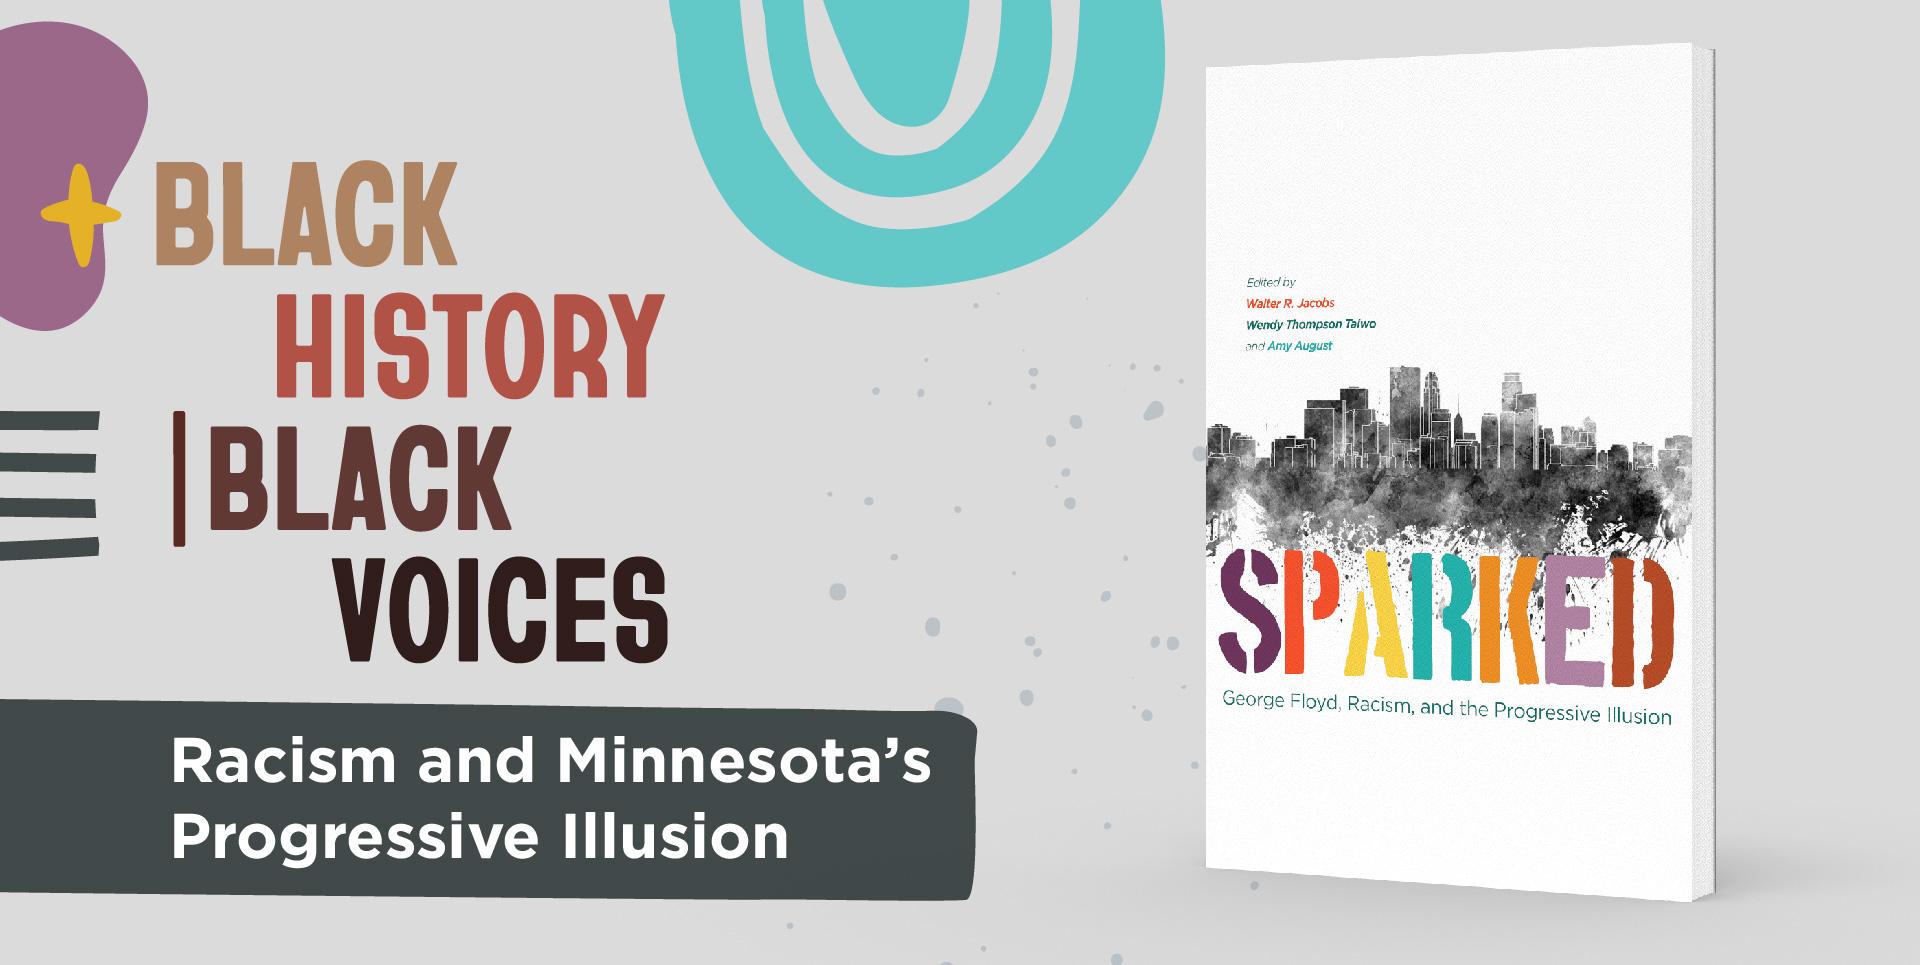 Racism and Minnesota's Progressive Illusion.